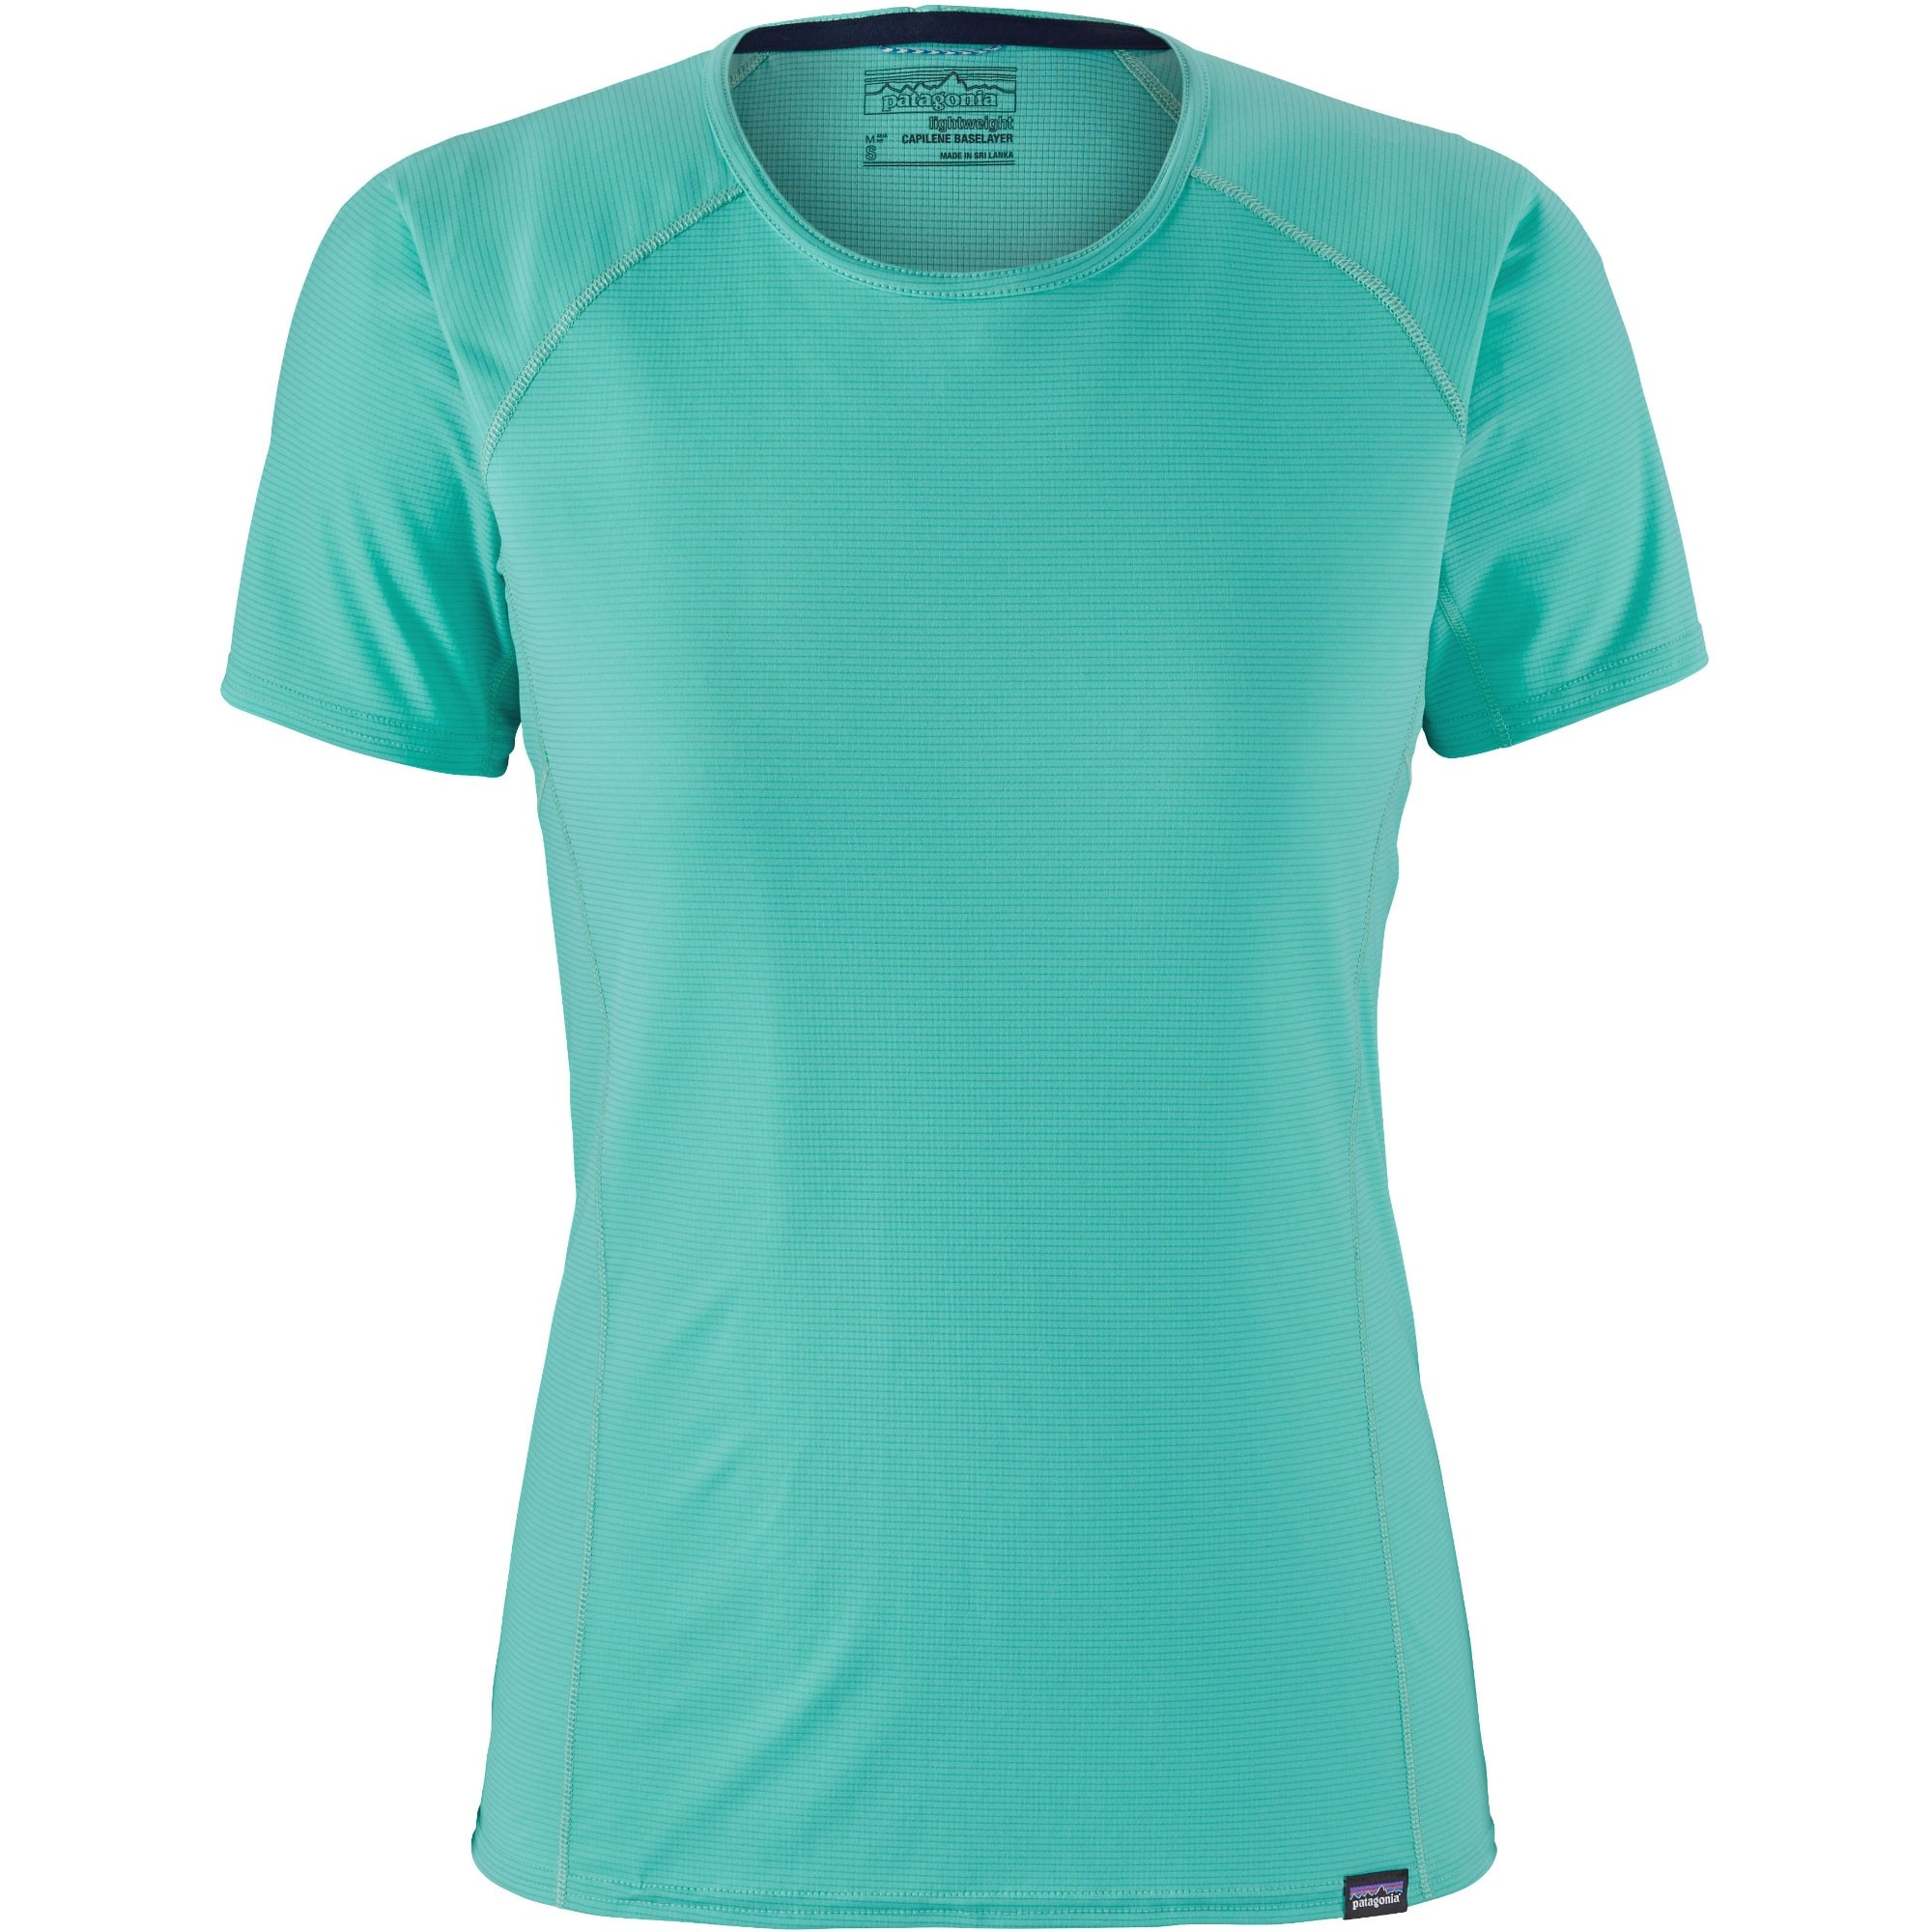 Patagonia-Capilene-Lightweight-T-Shirt-Womens-Strait-Blue-S18